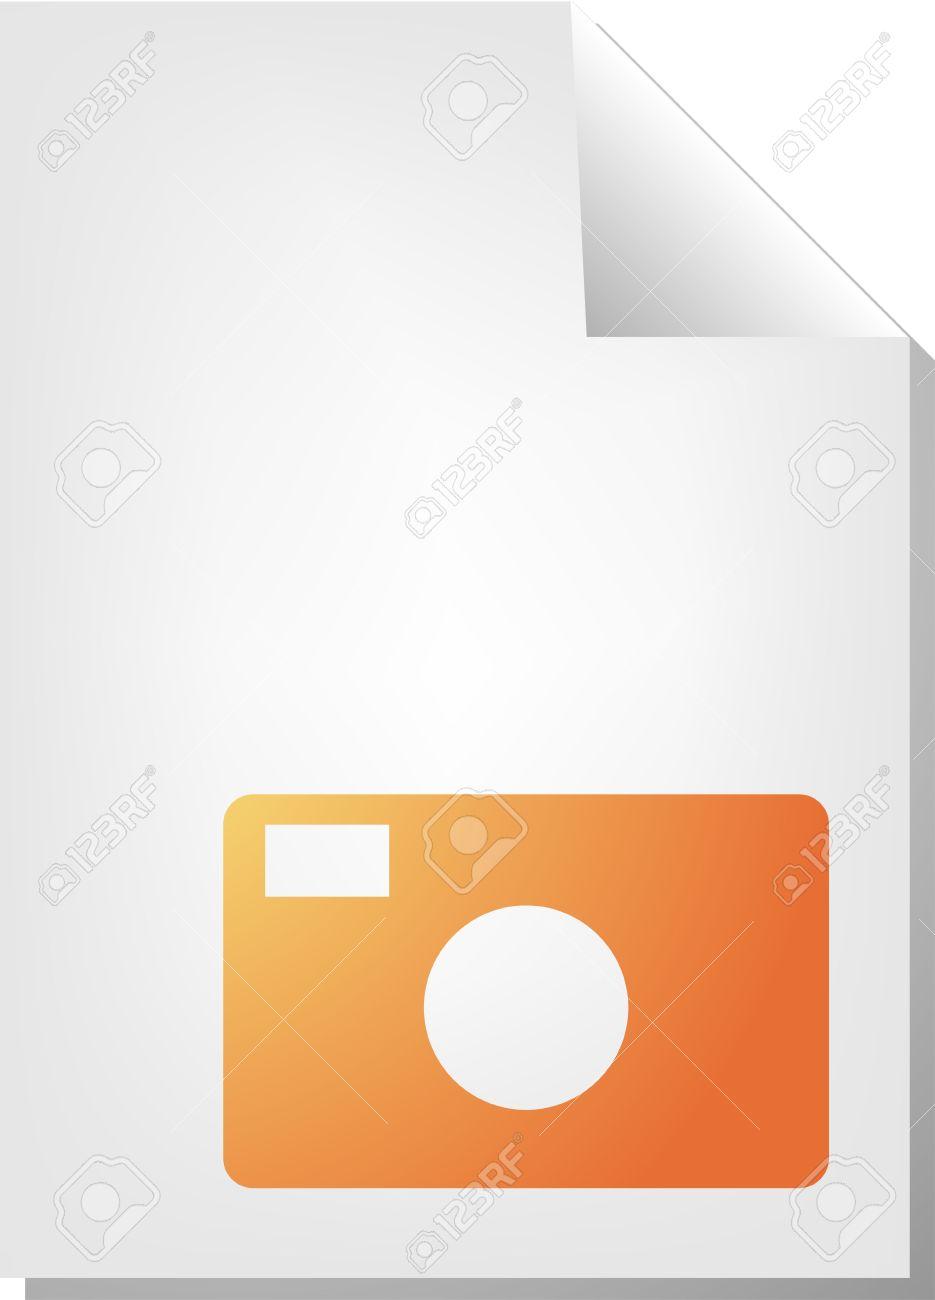 Photo Image Document File Type Illustration Clipart Stock Photo.